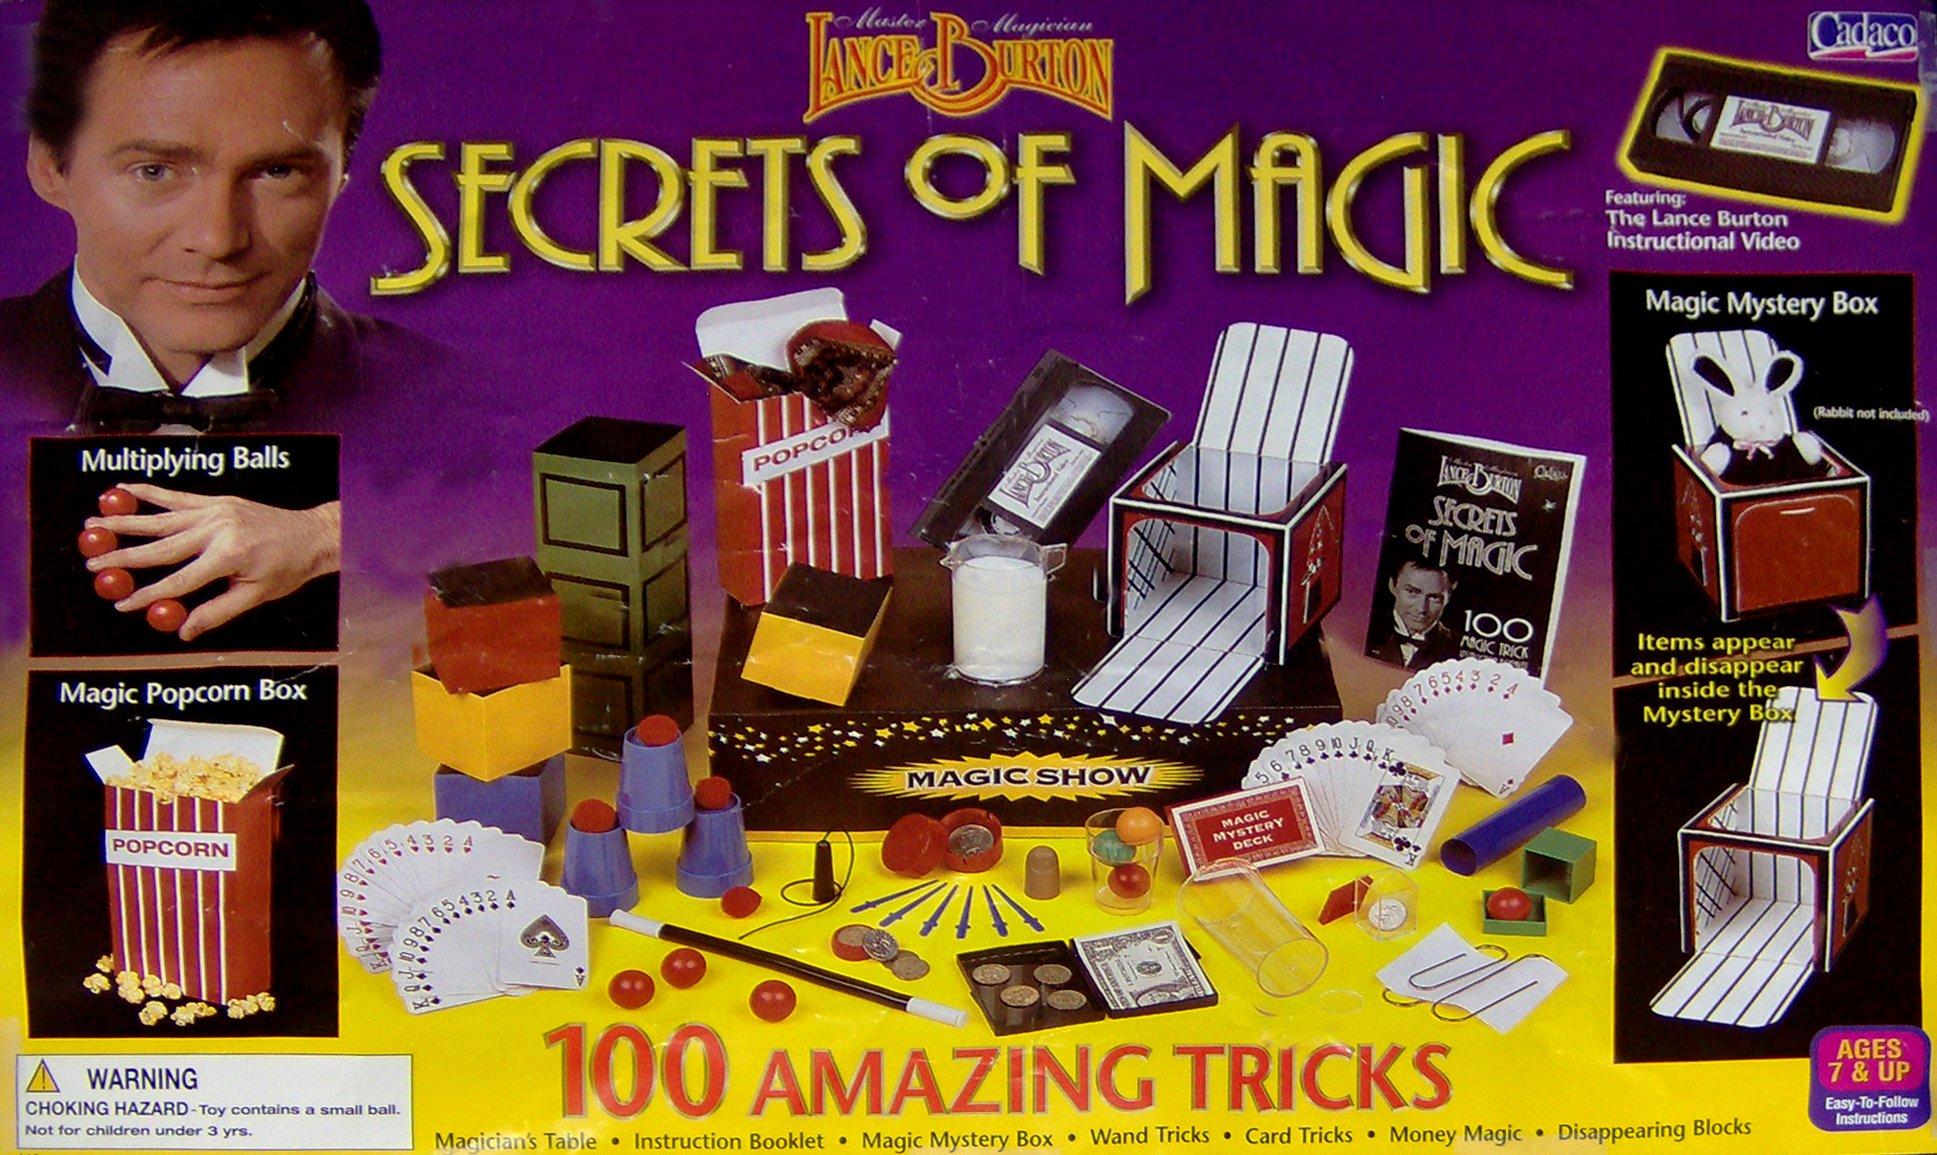 Lance Burton Magic Set: 100 Amazing Tricks